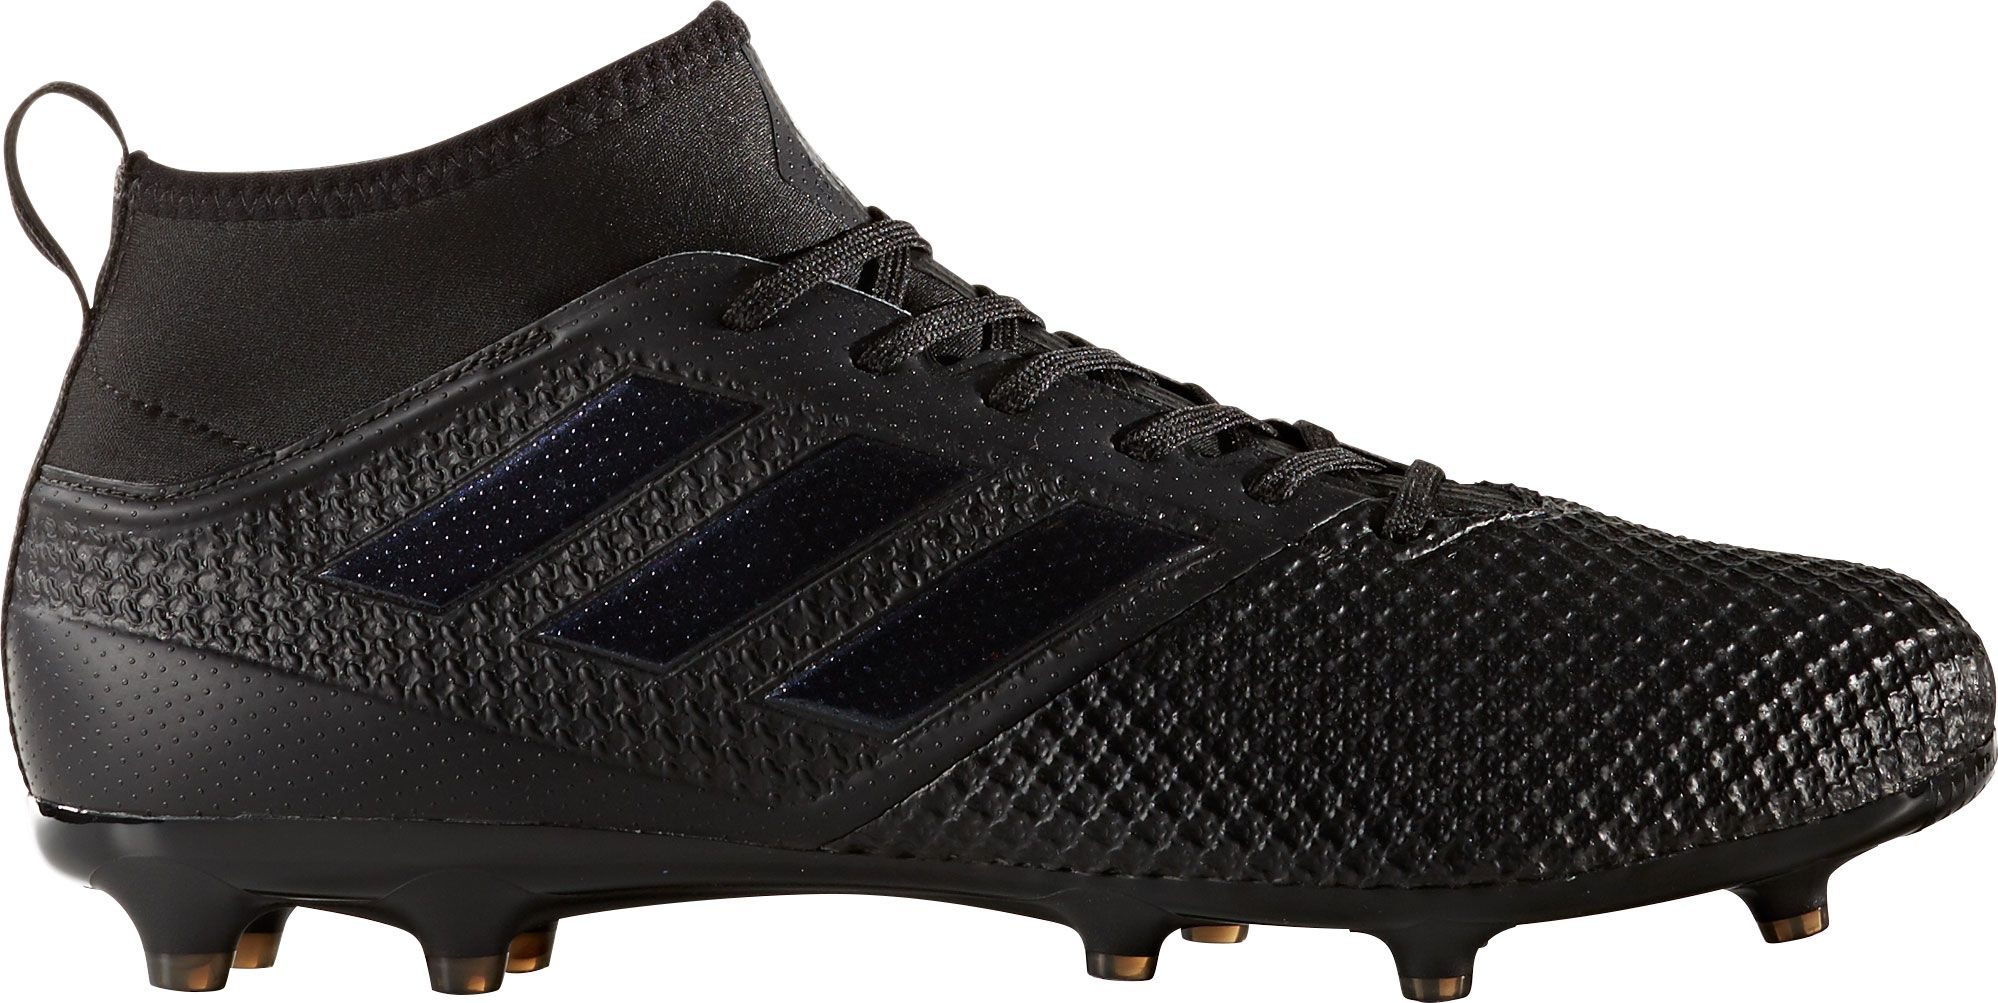 adidas 17.3 black